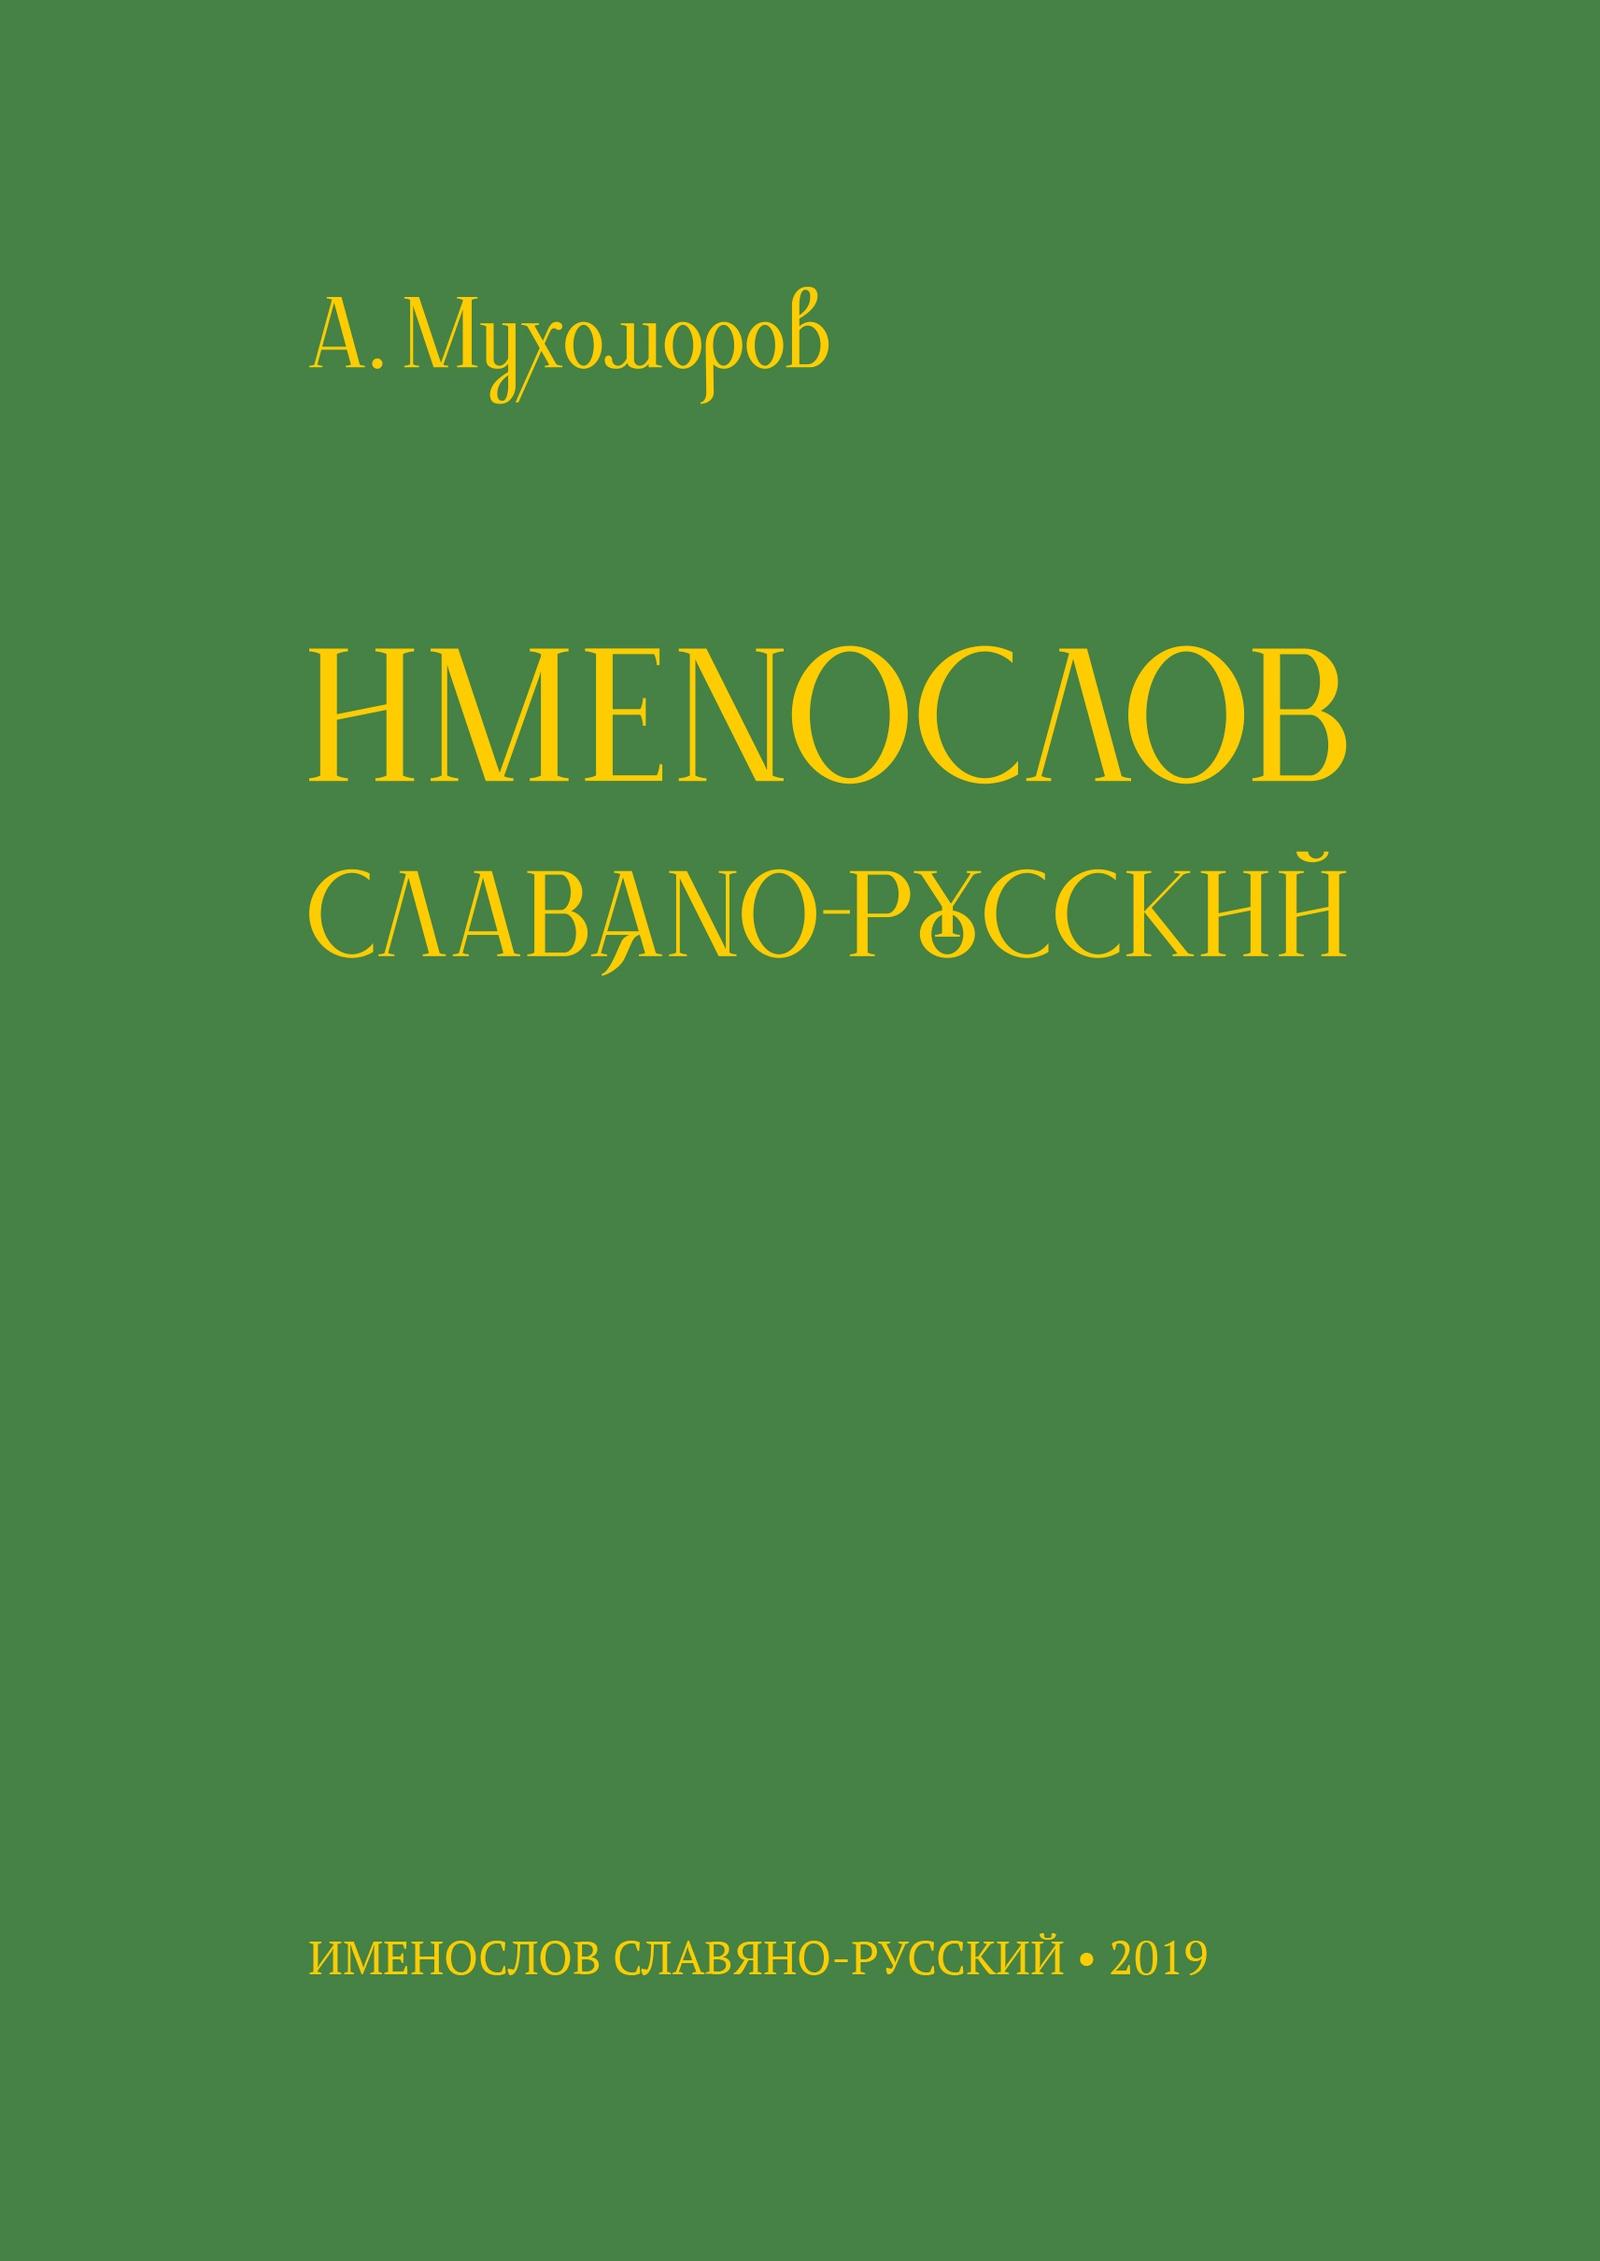 Именослов славяно-русский